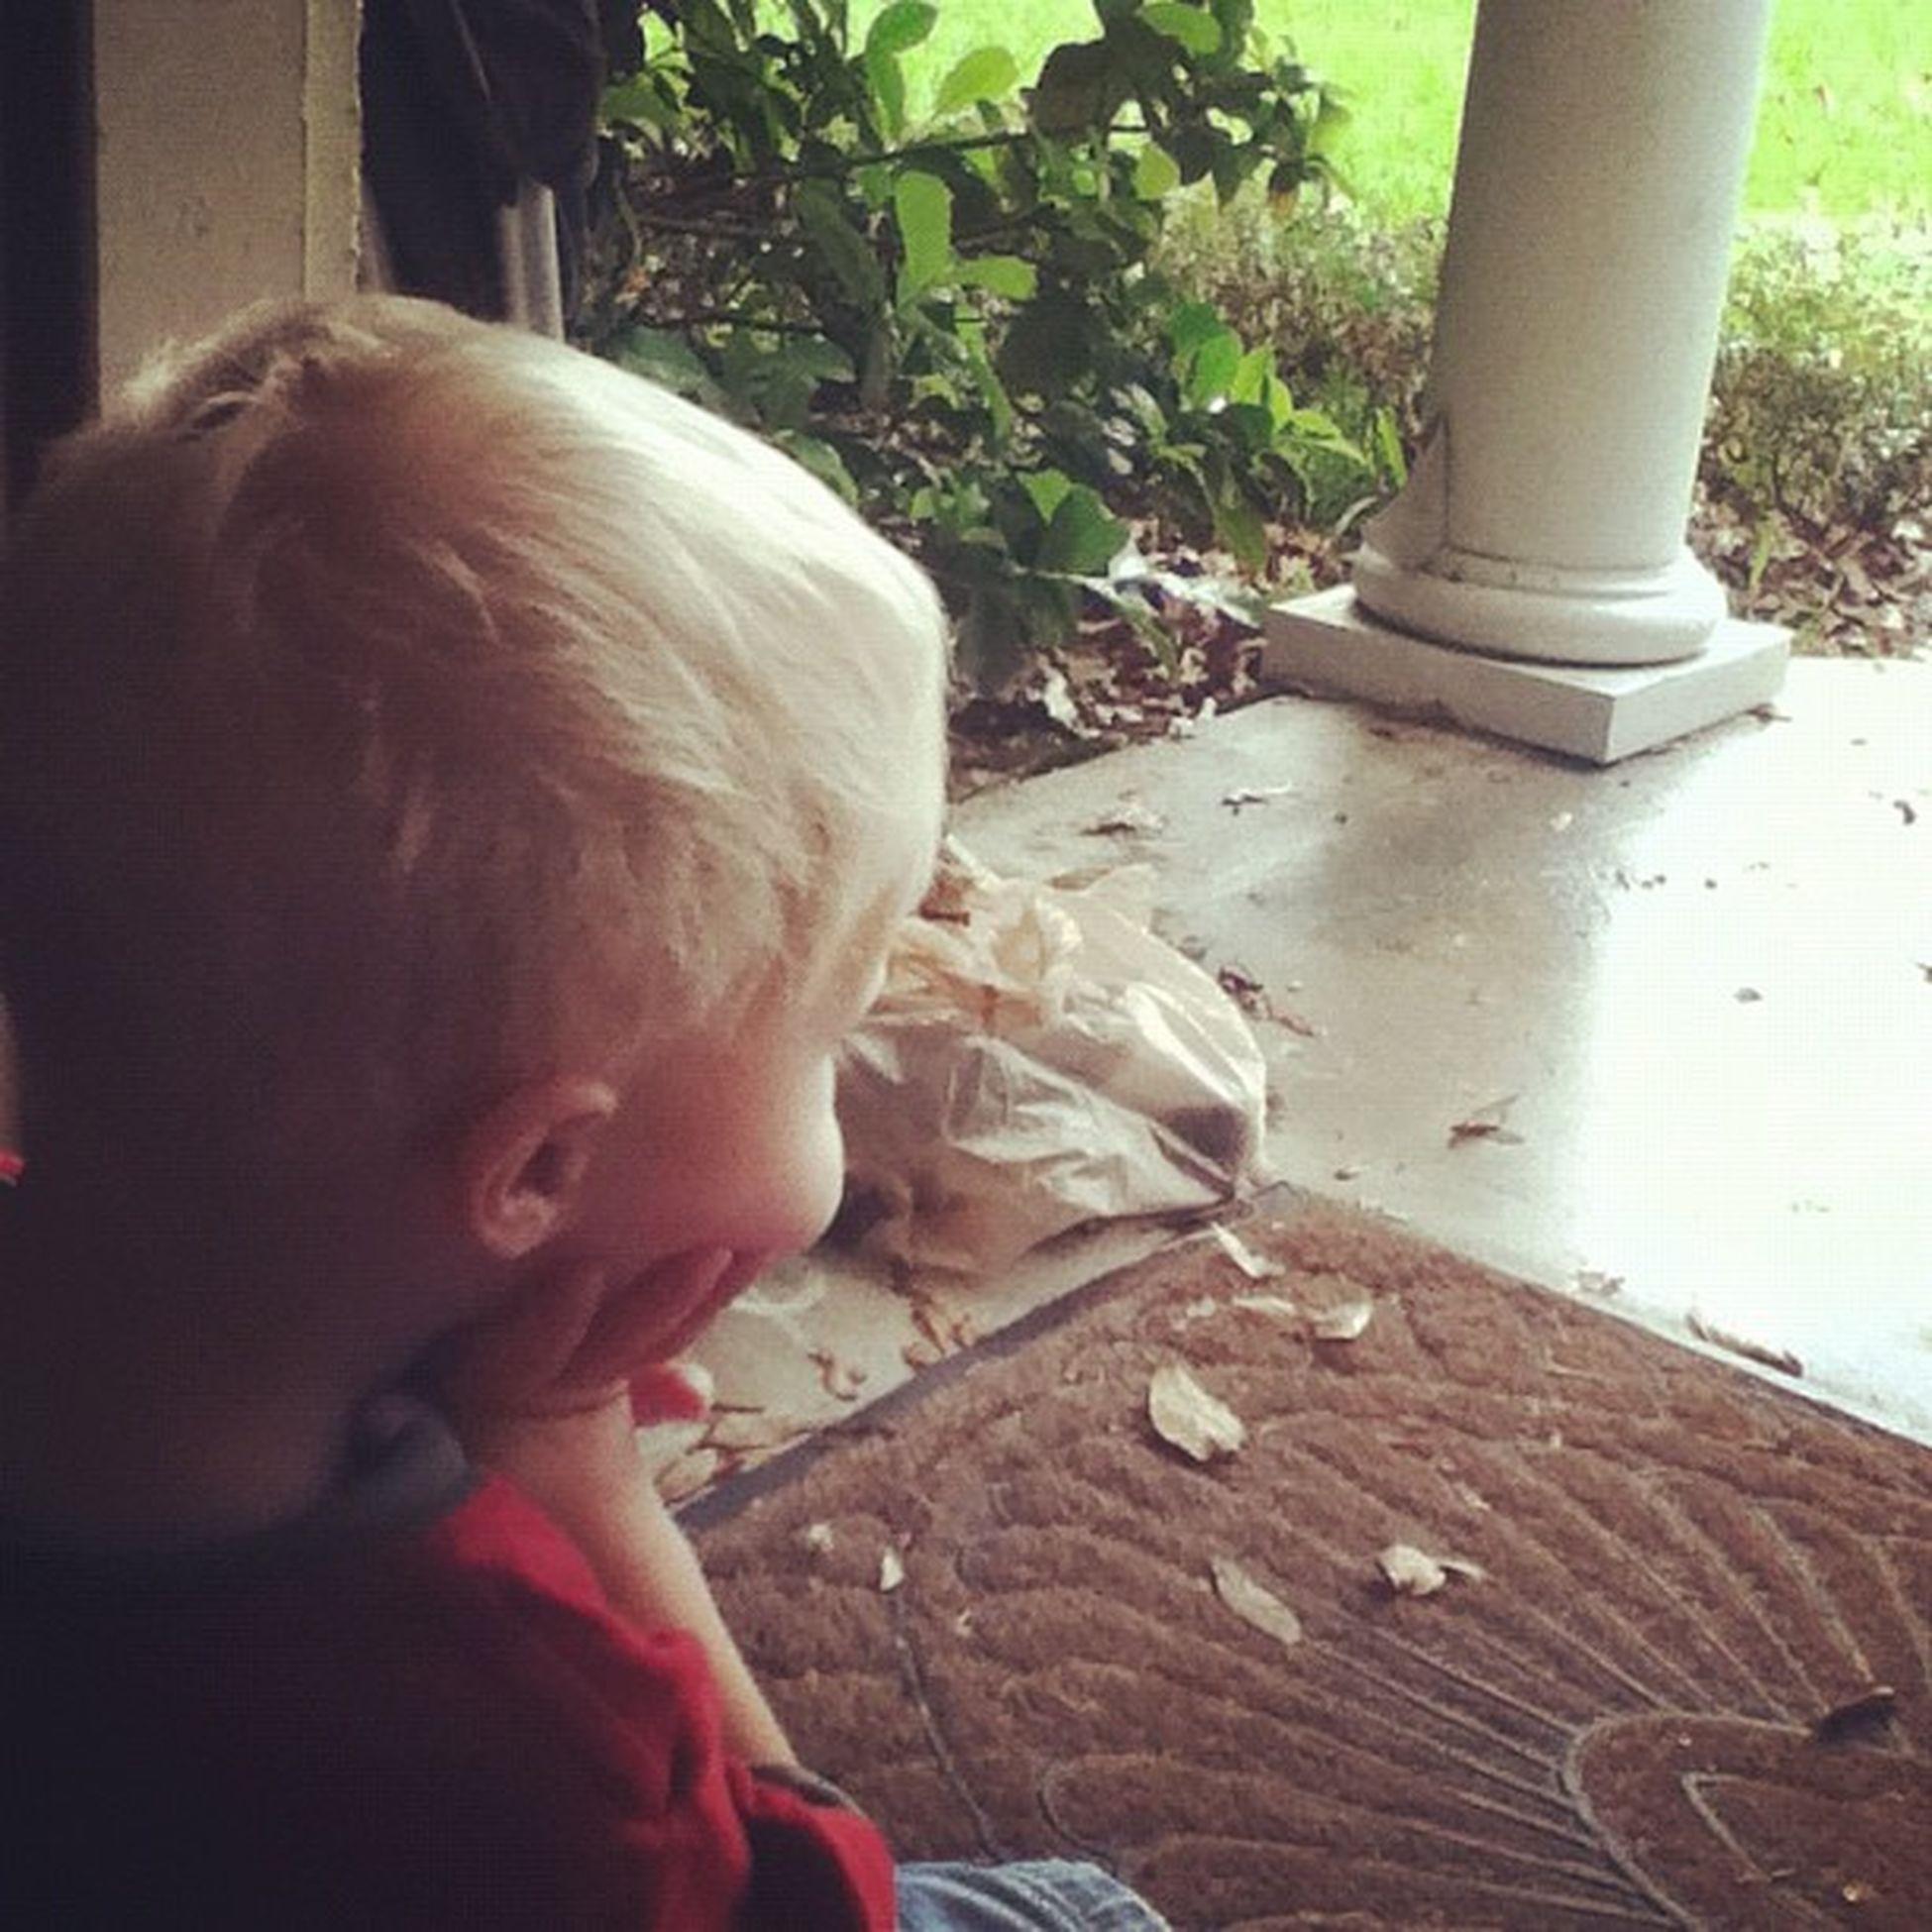 Daven!!! My little cousin 4 of 4! Ahaha it's raining outside... Daven Raining Sitting in the doorway like a boss! Ahaha!